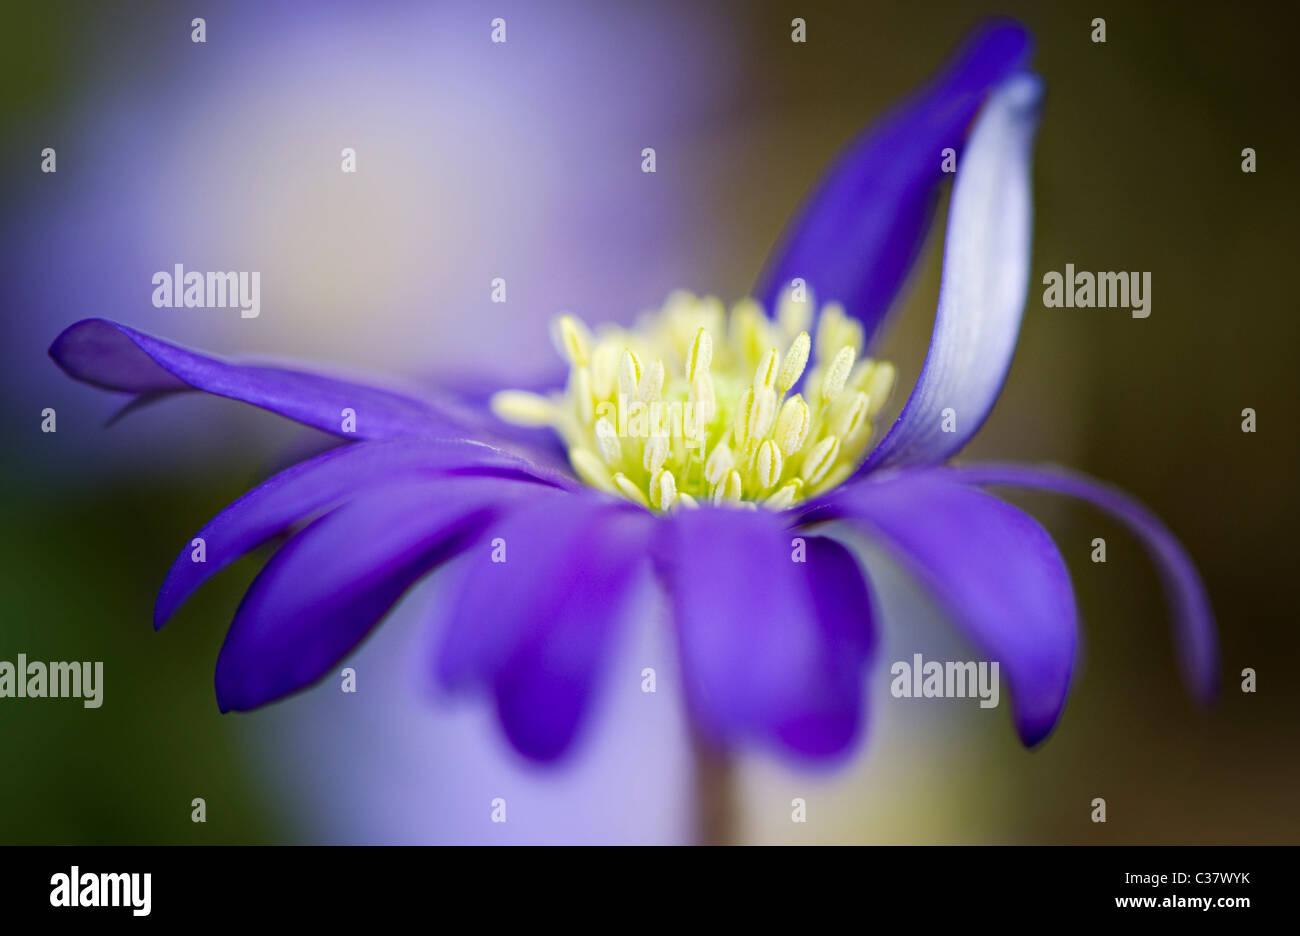 A single blue Anemone Blanda flower - Windflower Stock Photo